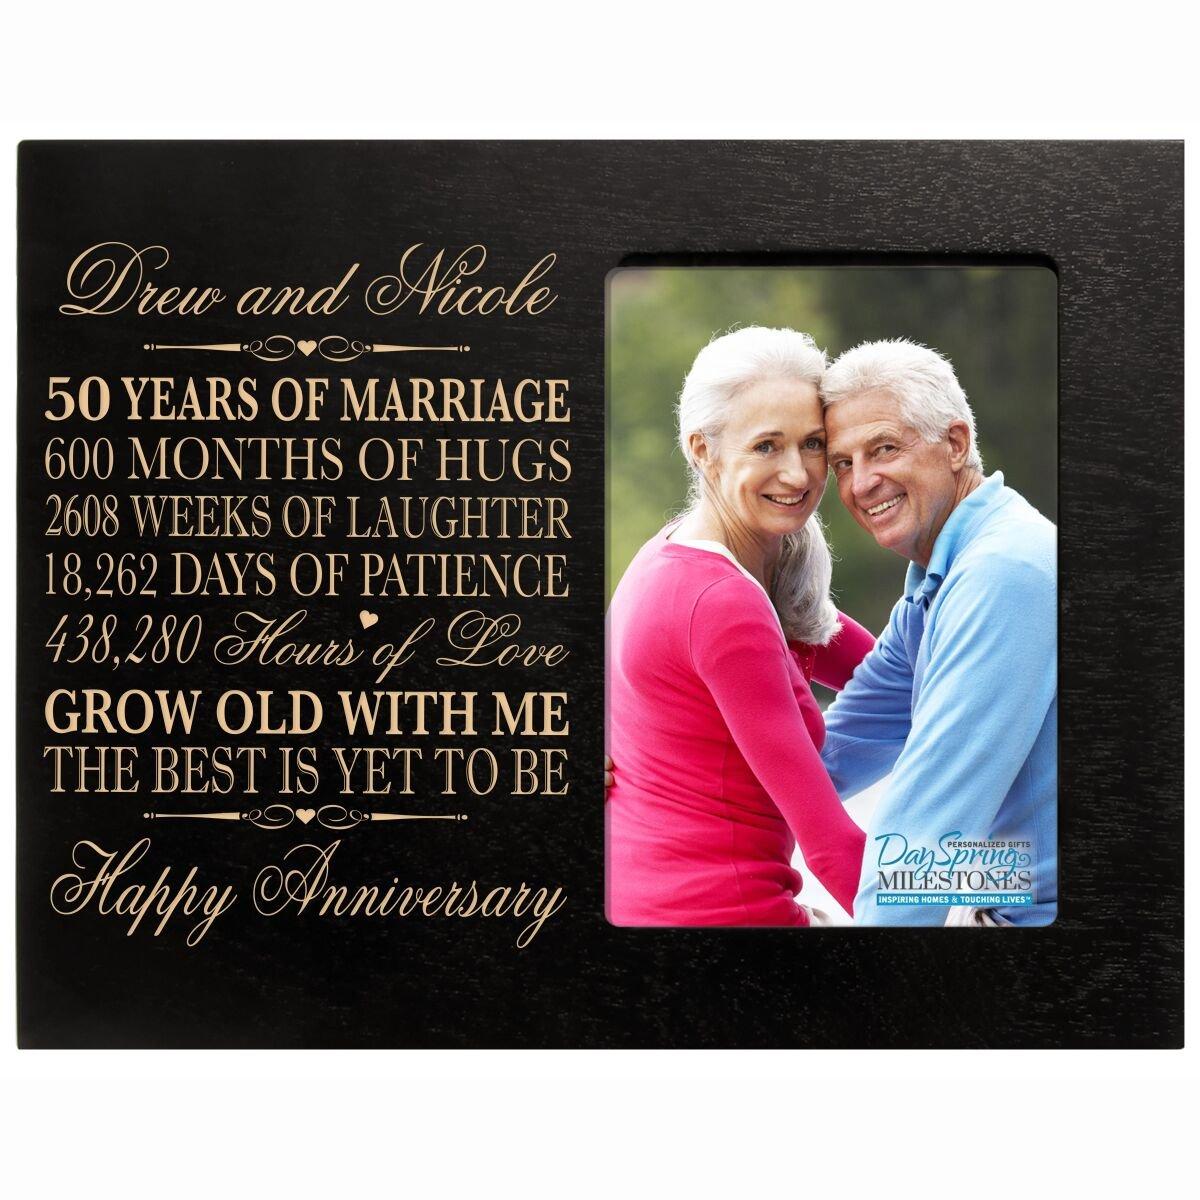 Buy 50th Anniversary - Personalized Wedding Anniversary